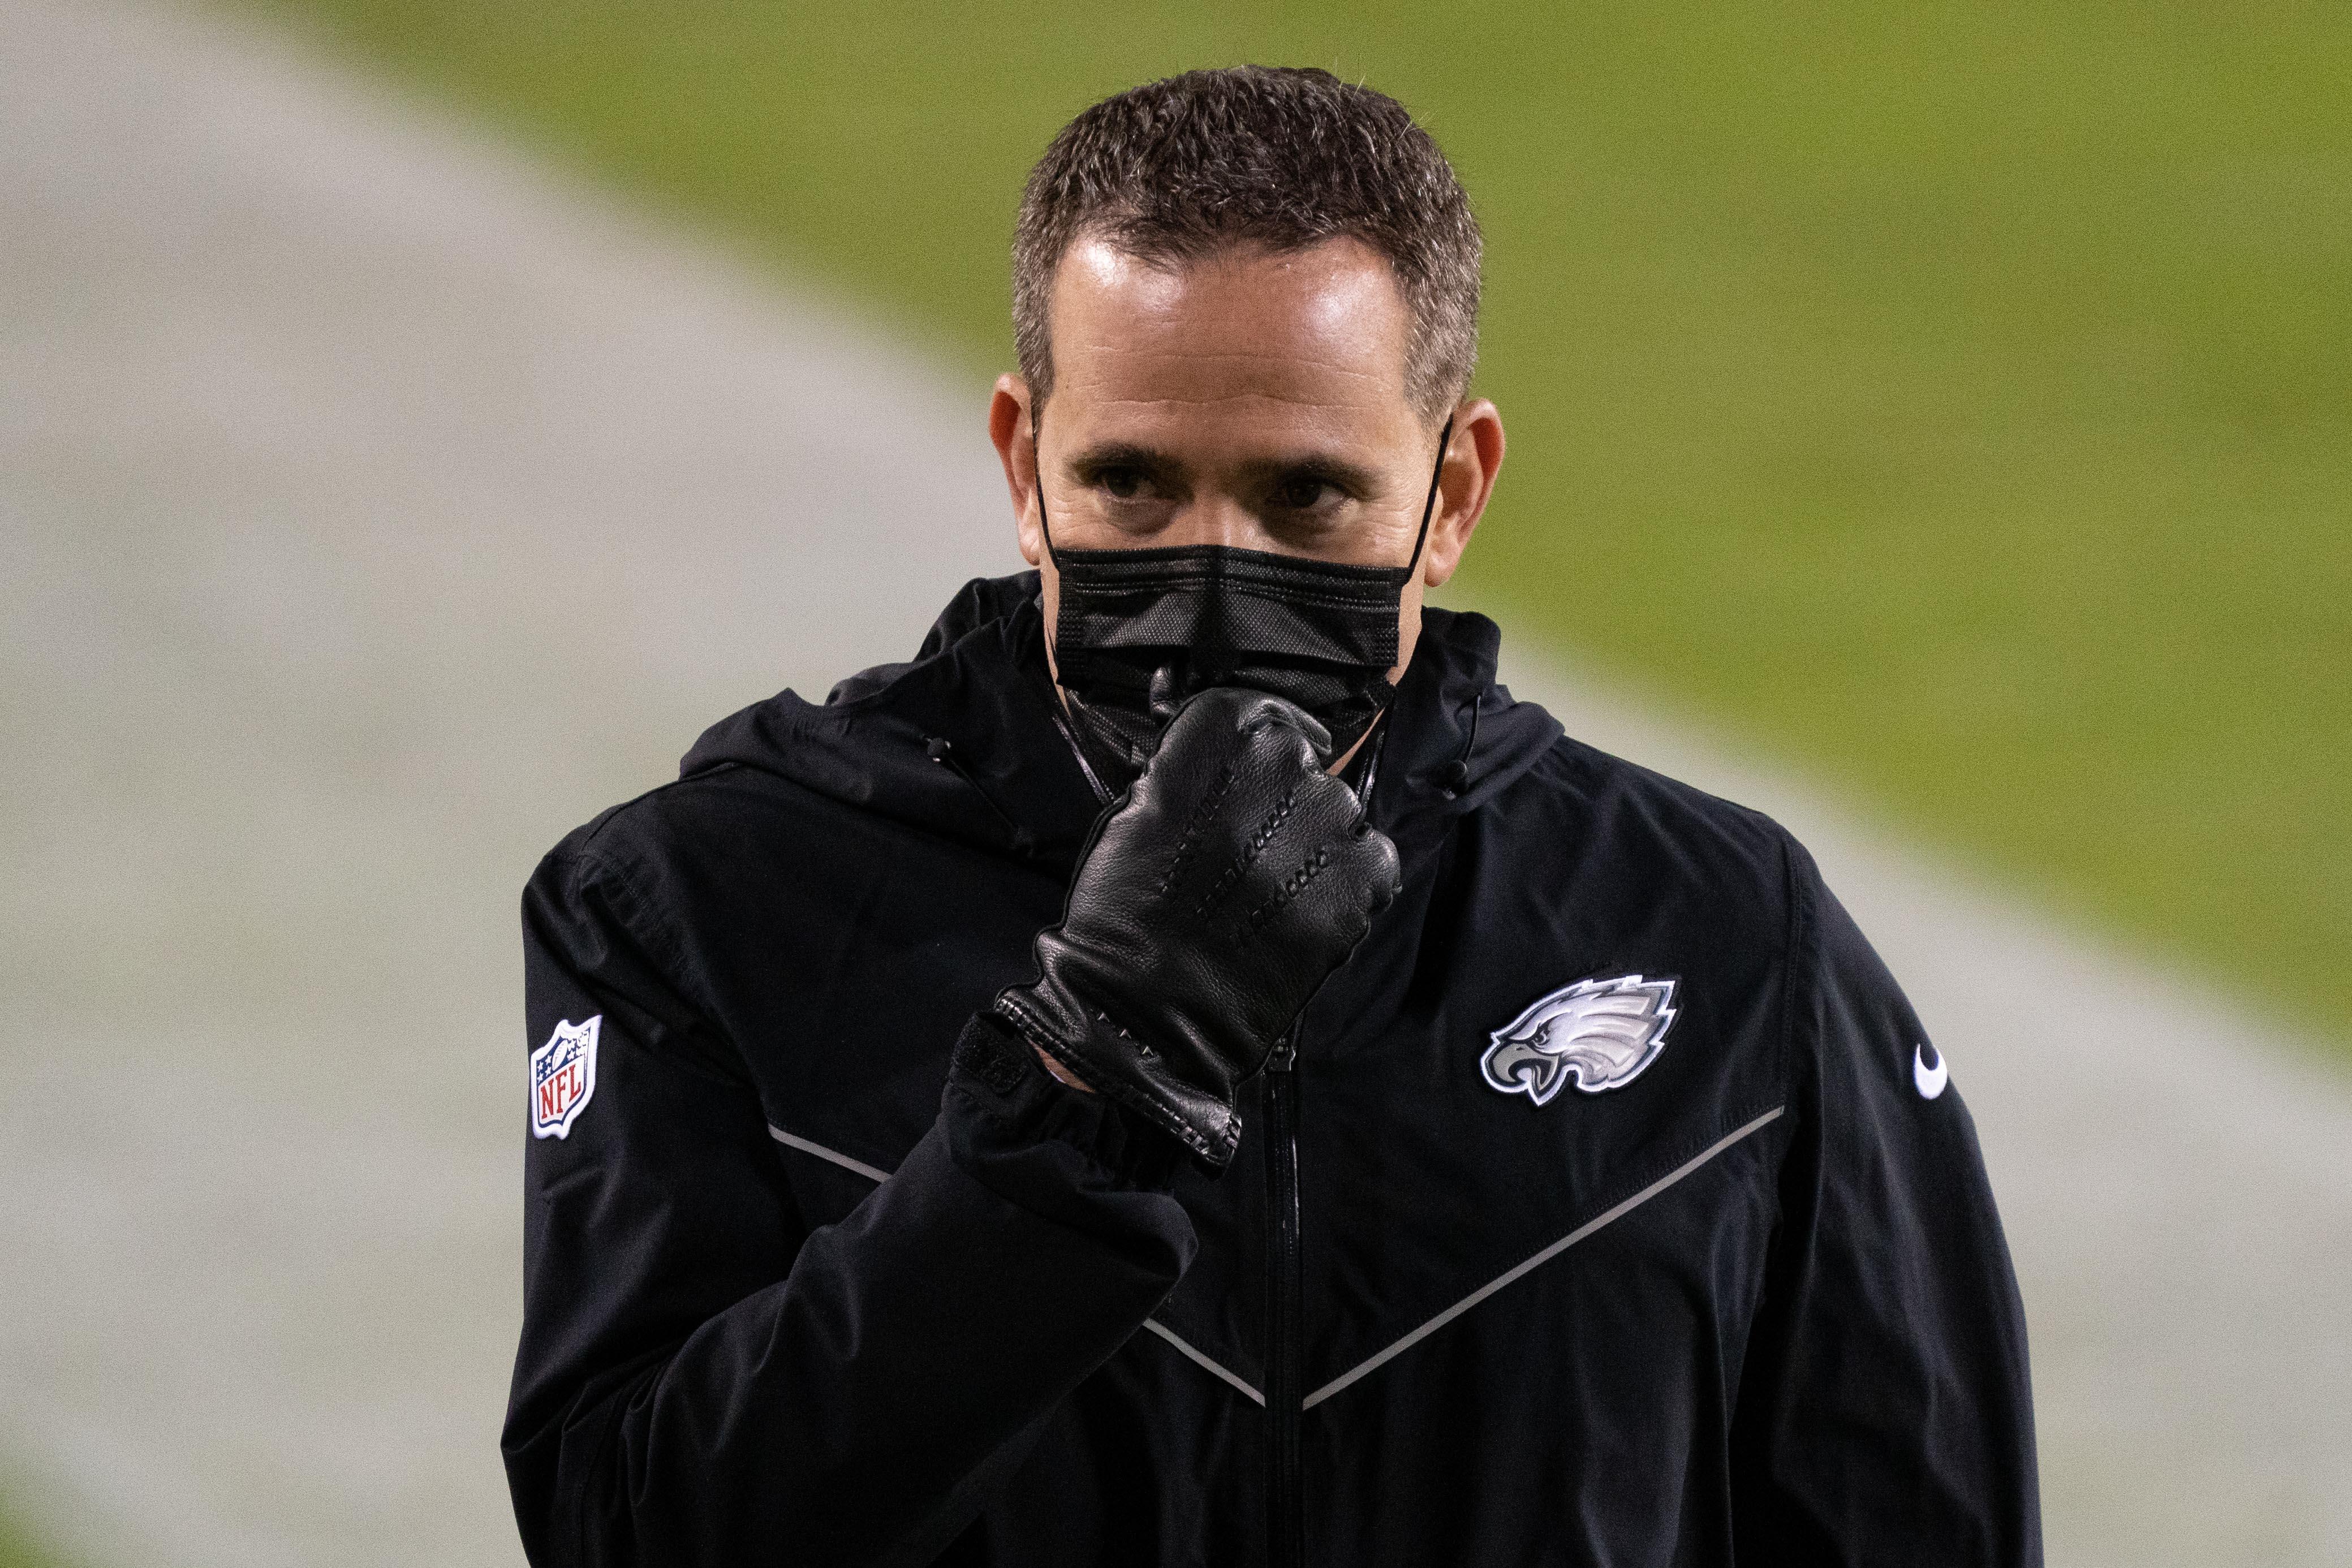 Howie Roseman believes trading Carson Wentz was in Eagles' best interest